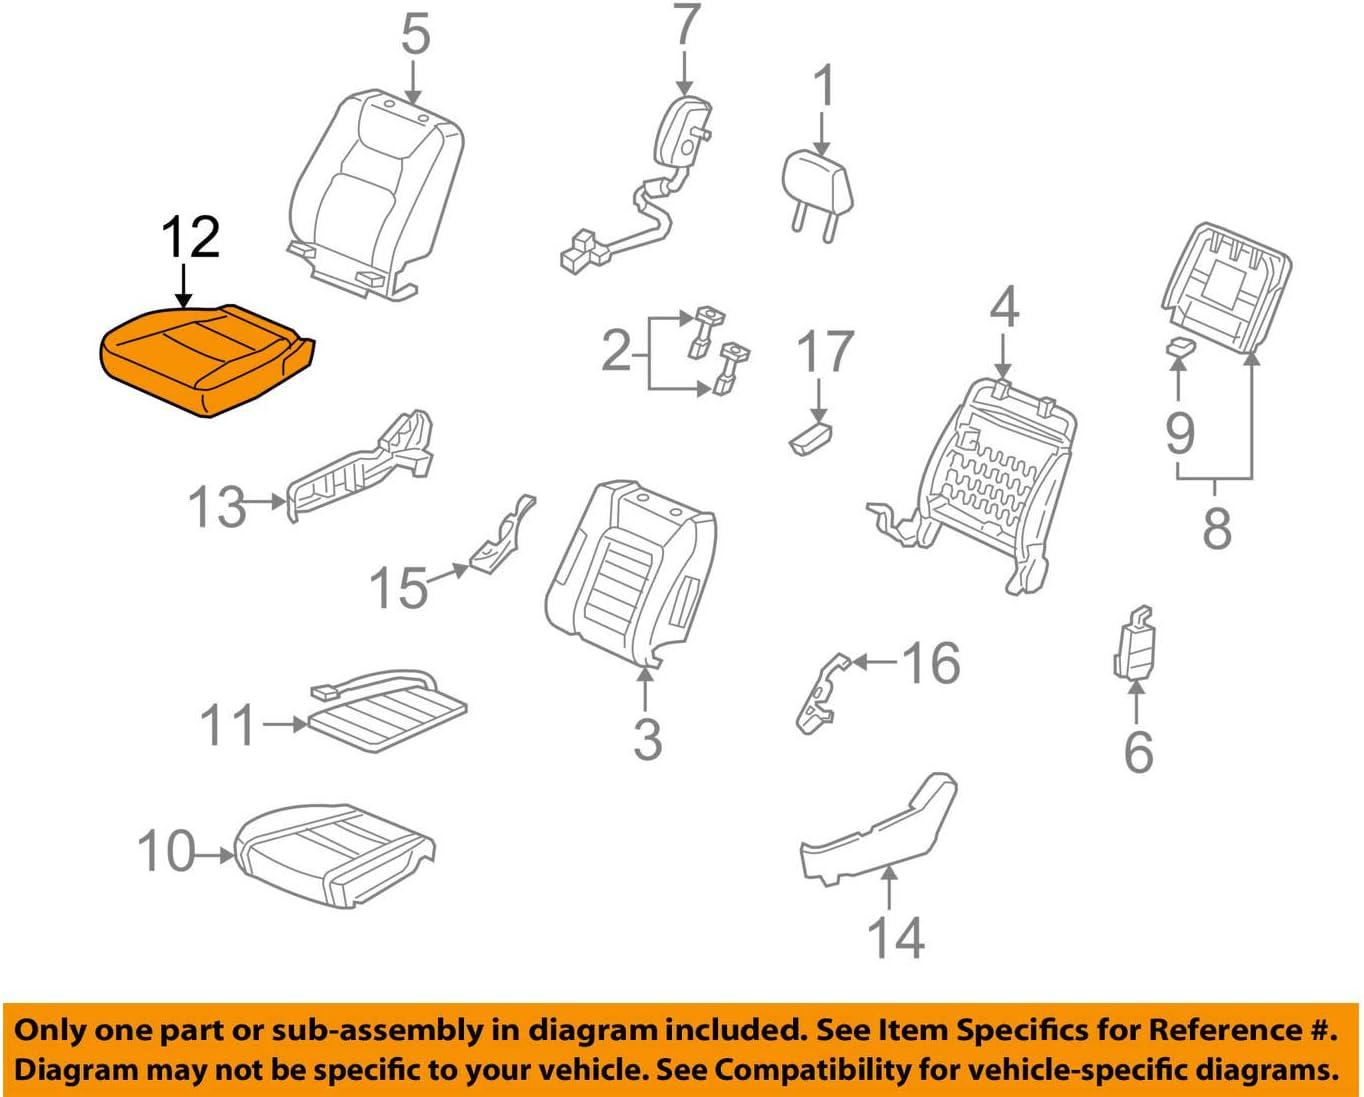 Honda Genuine 81131-SJC-L31ZA Elegant 2021new shipping free Seat Cushion Cover Trim Right Fr